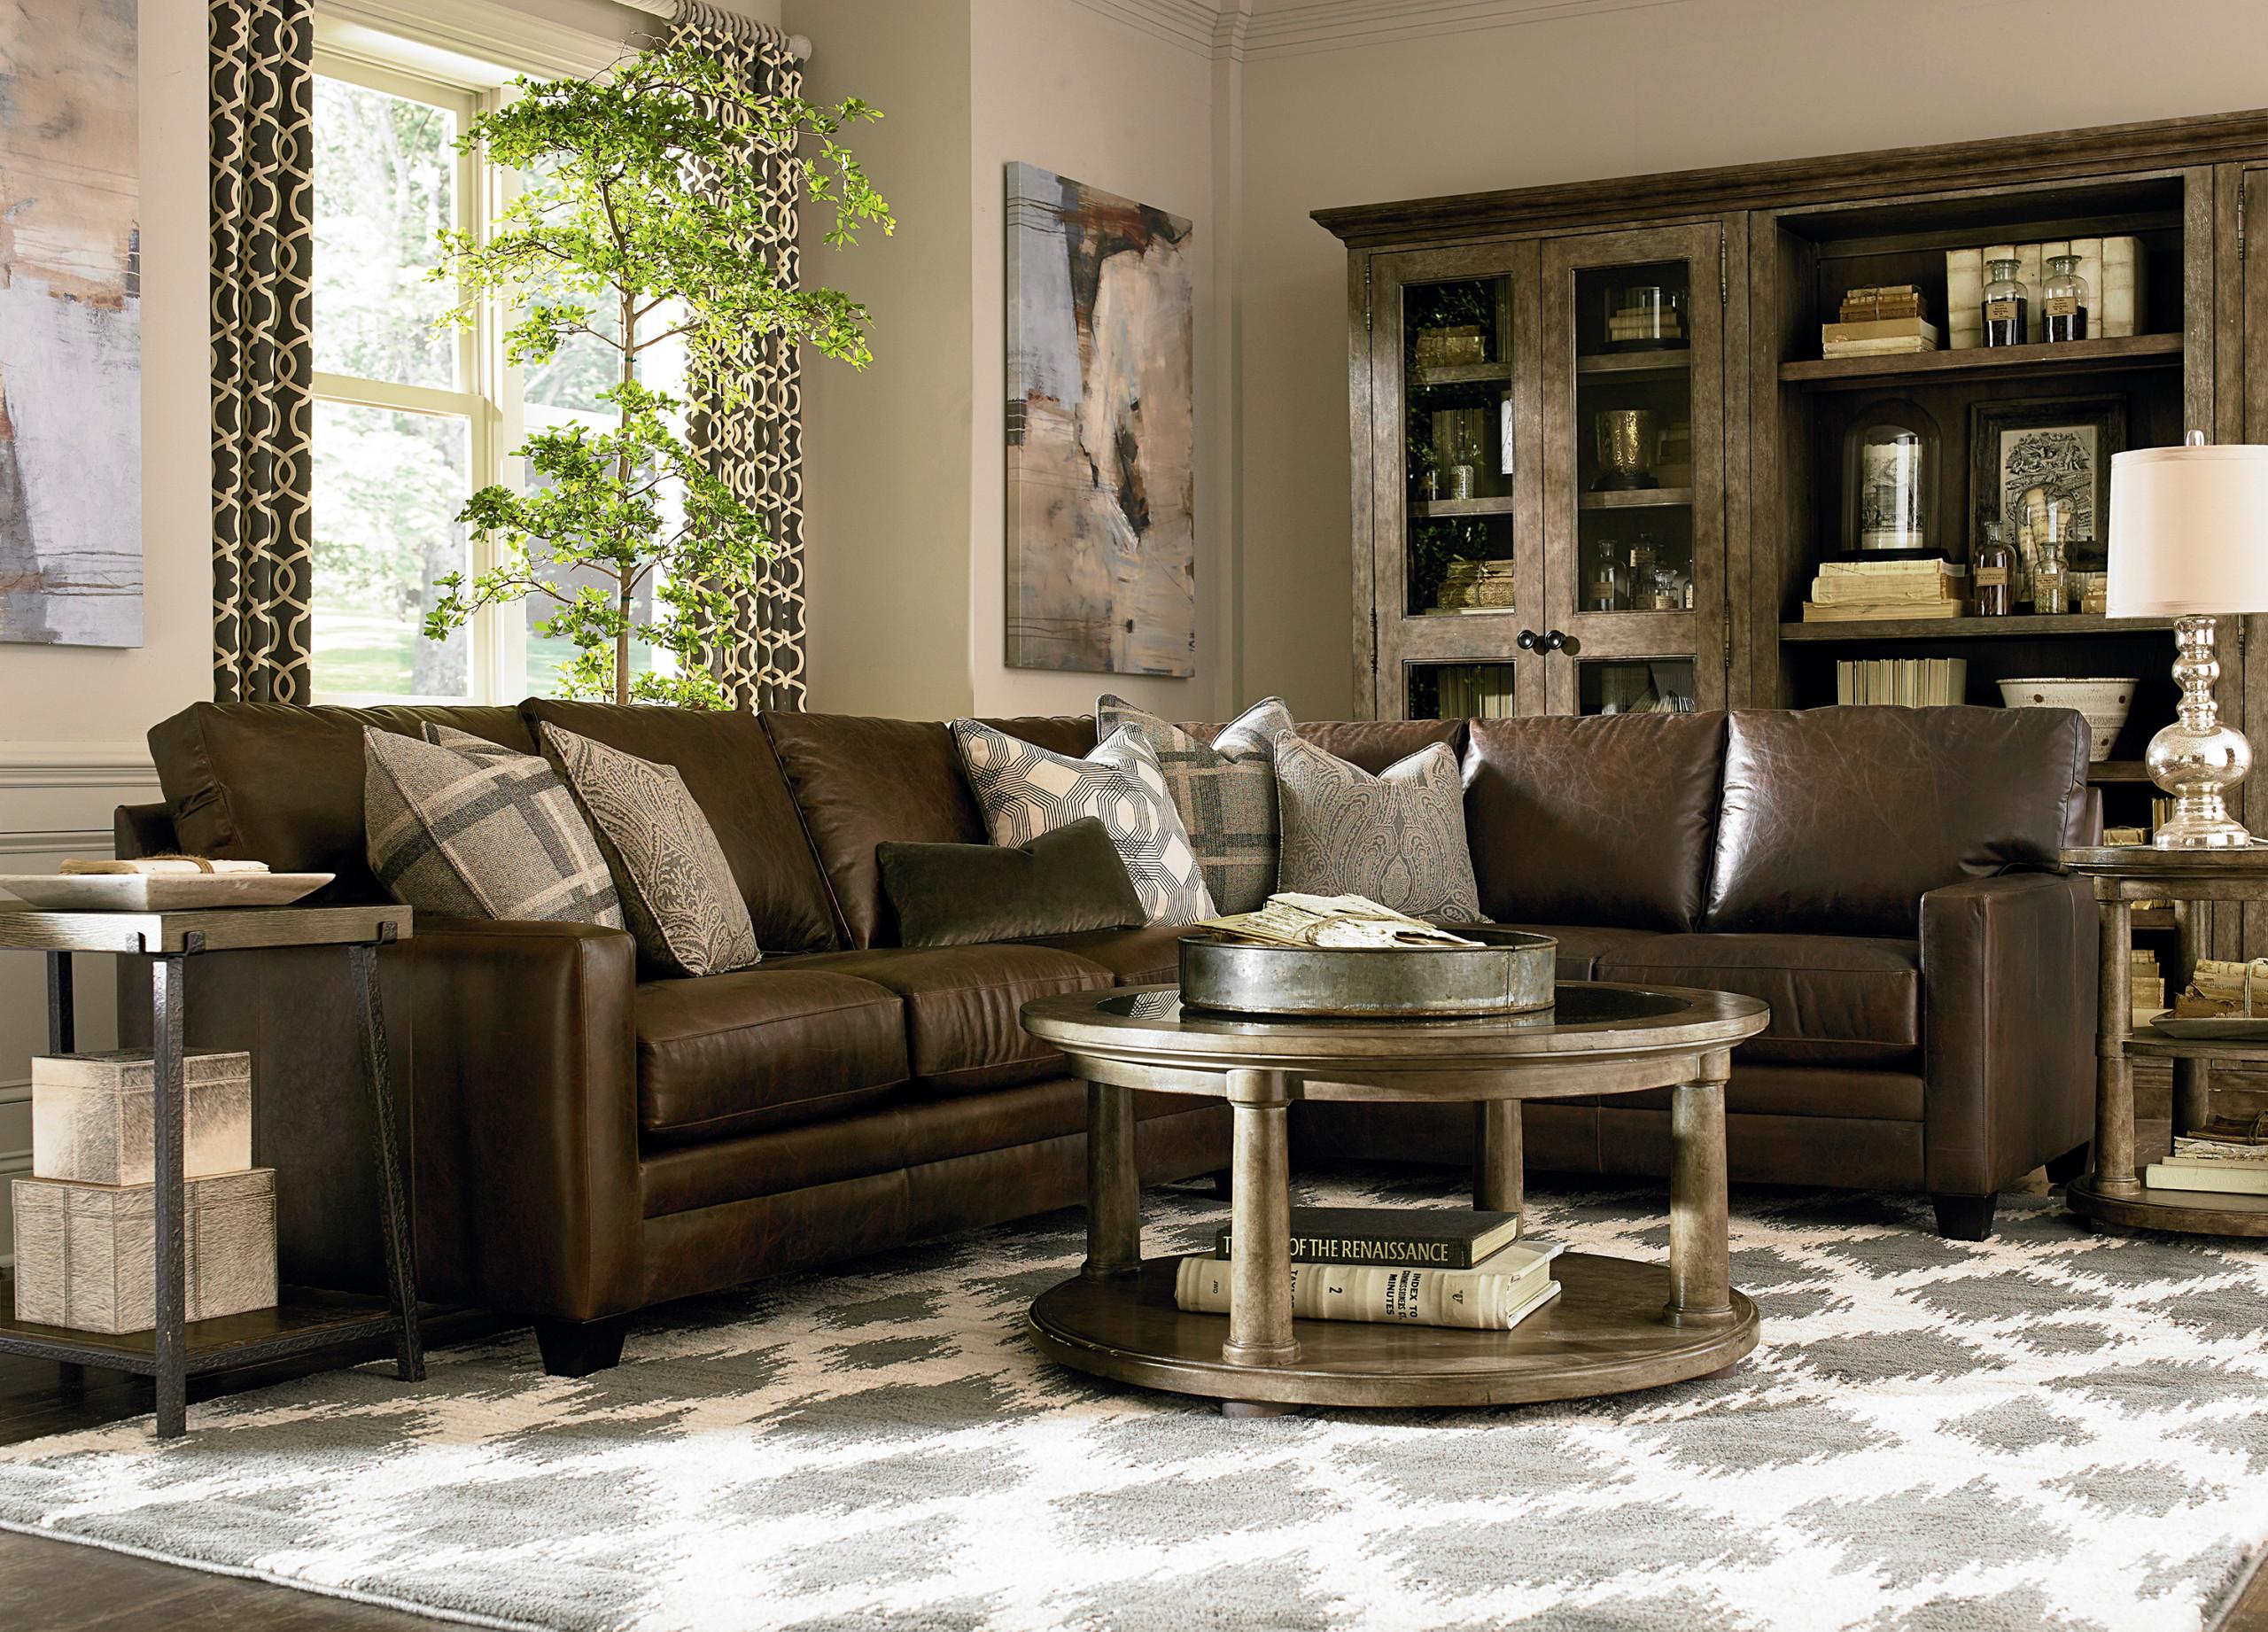 Dark Brown Sofa Houzz, Brown Leather Furniture Living Room Ideas